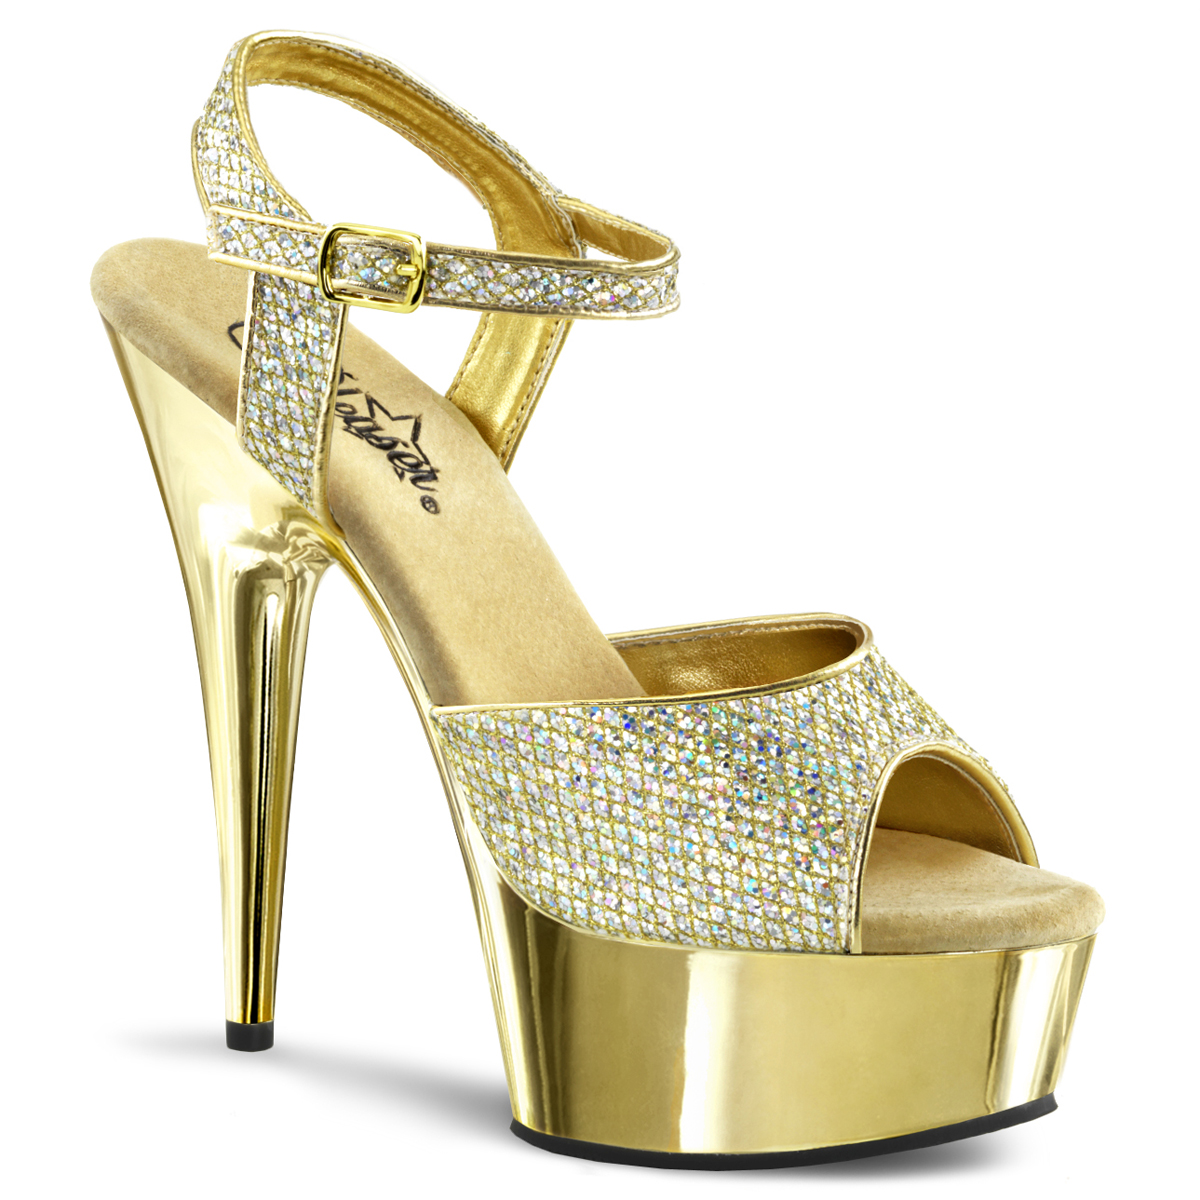 b1fe2a771c2 Platform High Heels DELIGHT-609-5G - Gold Glitter